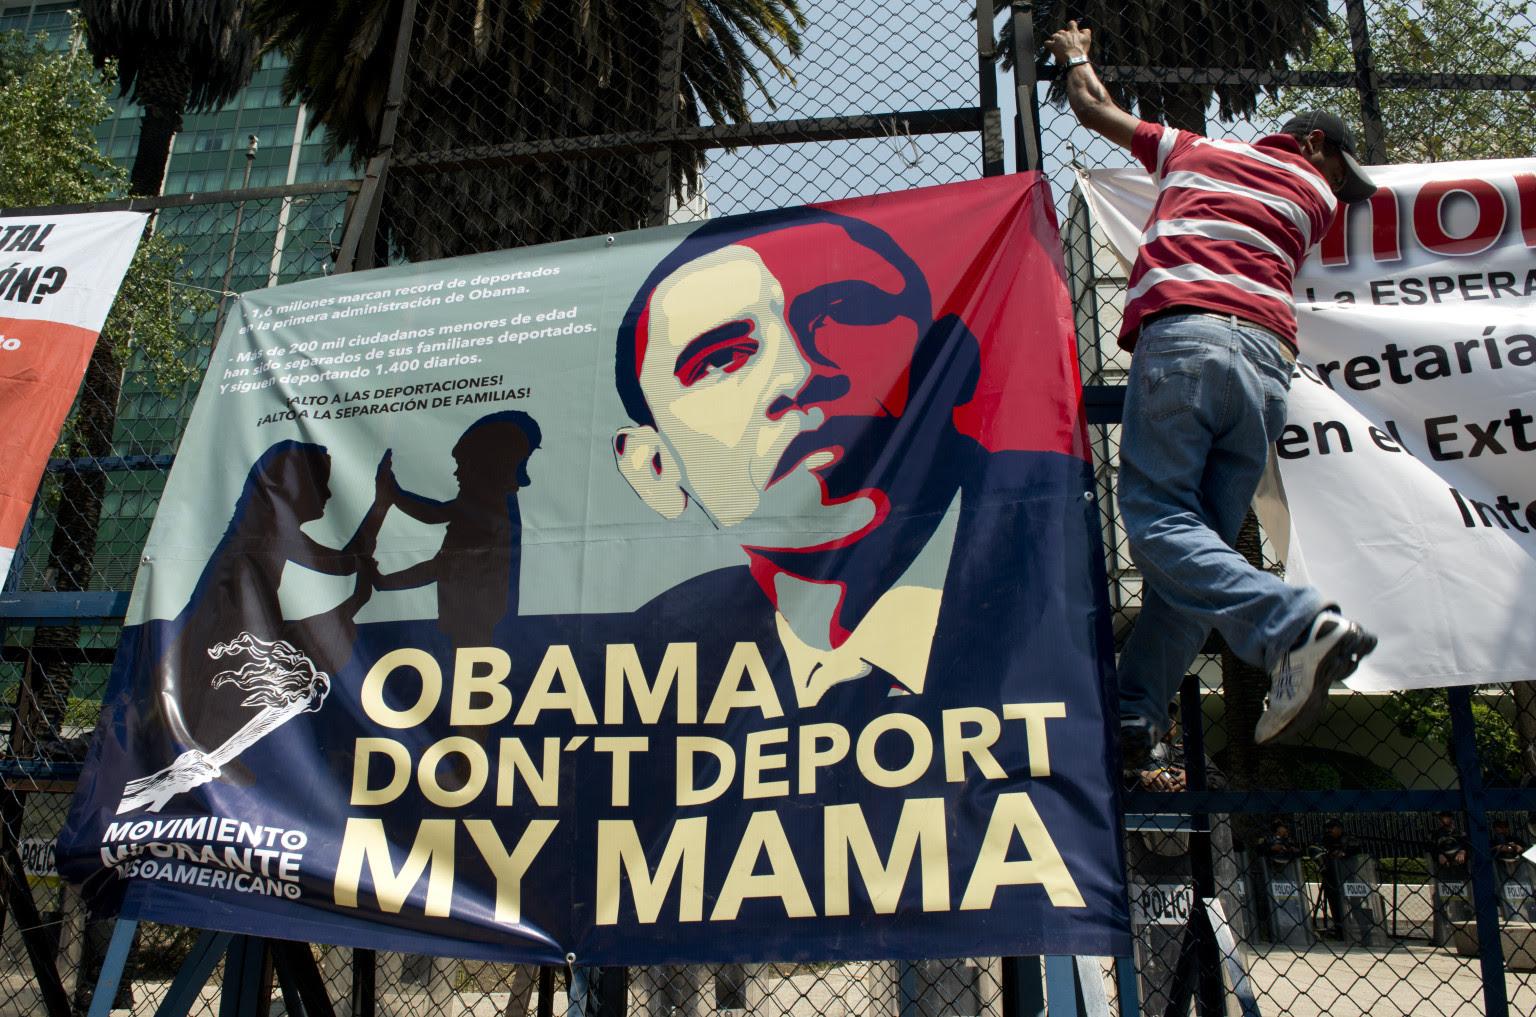 http://atlantablackstar.com/wp-content/uploads/2014/04/Deportation-Obama-HuffPost.jpg